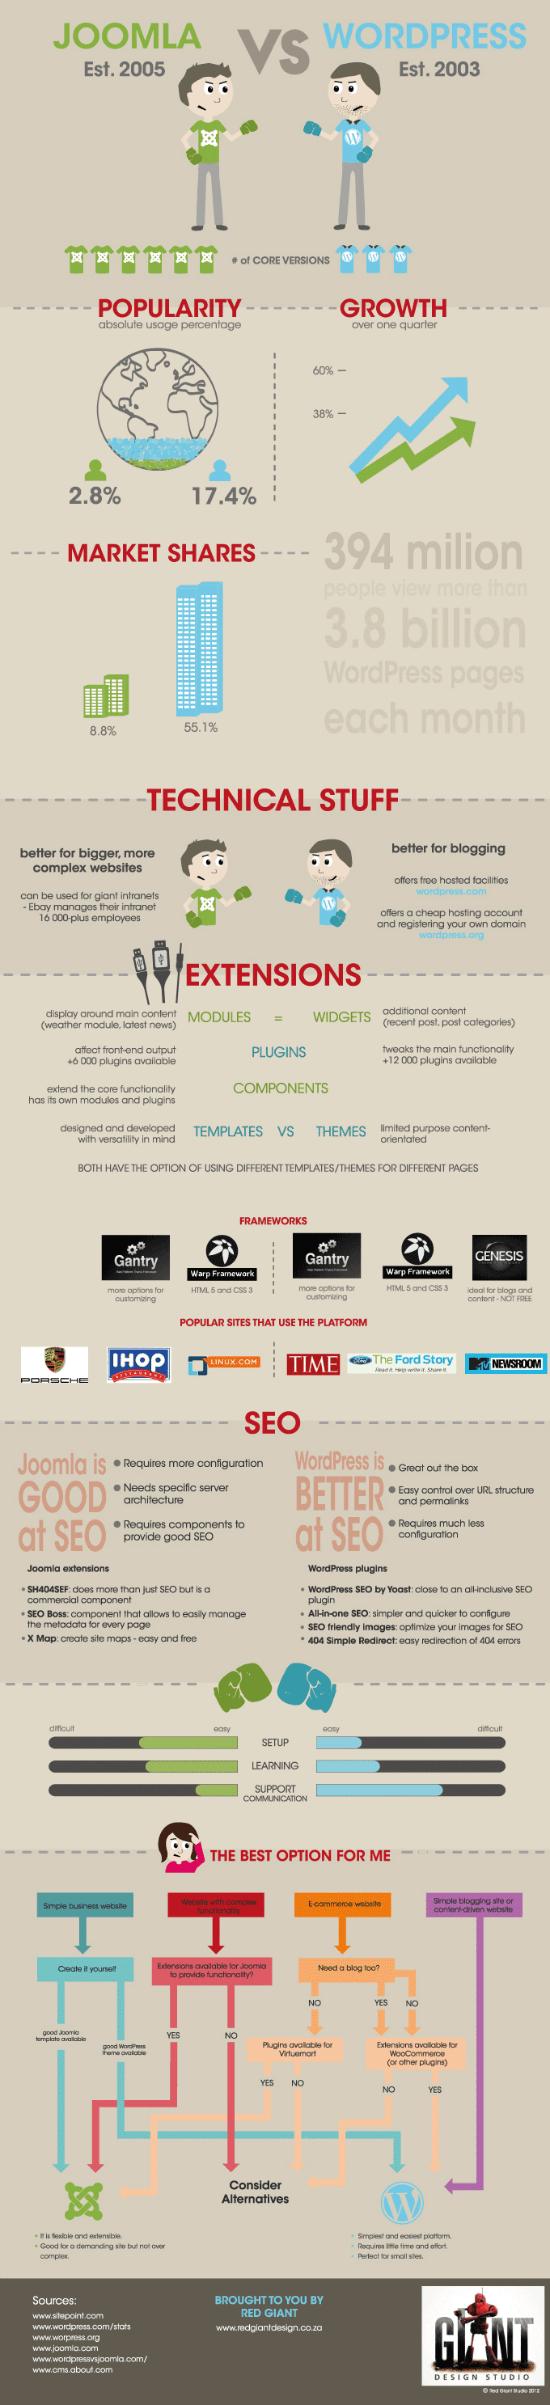 Wordpress Vs Joomla Css Three And More